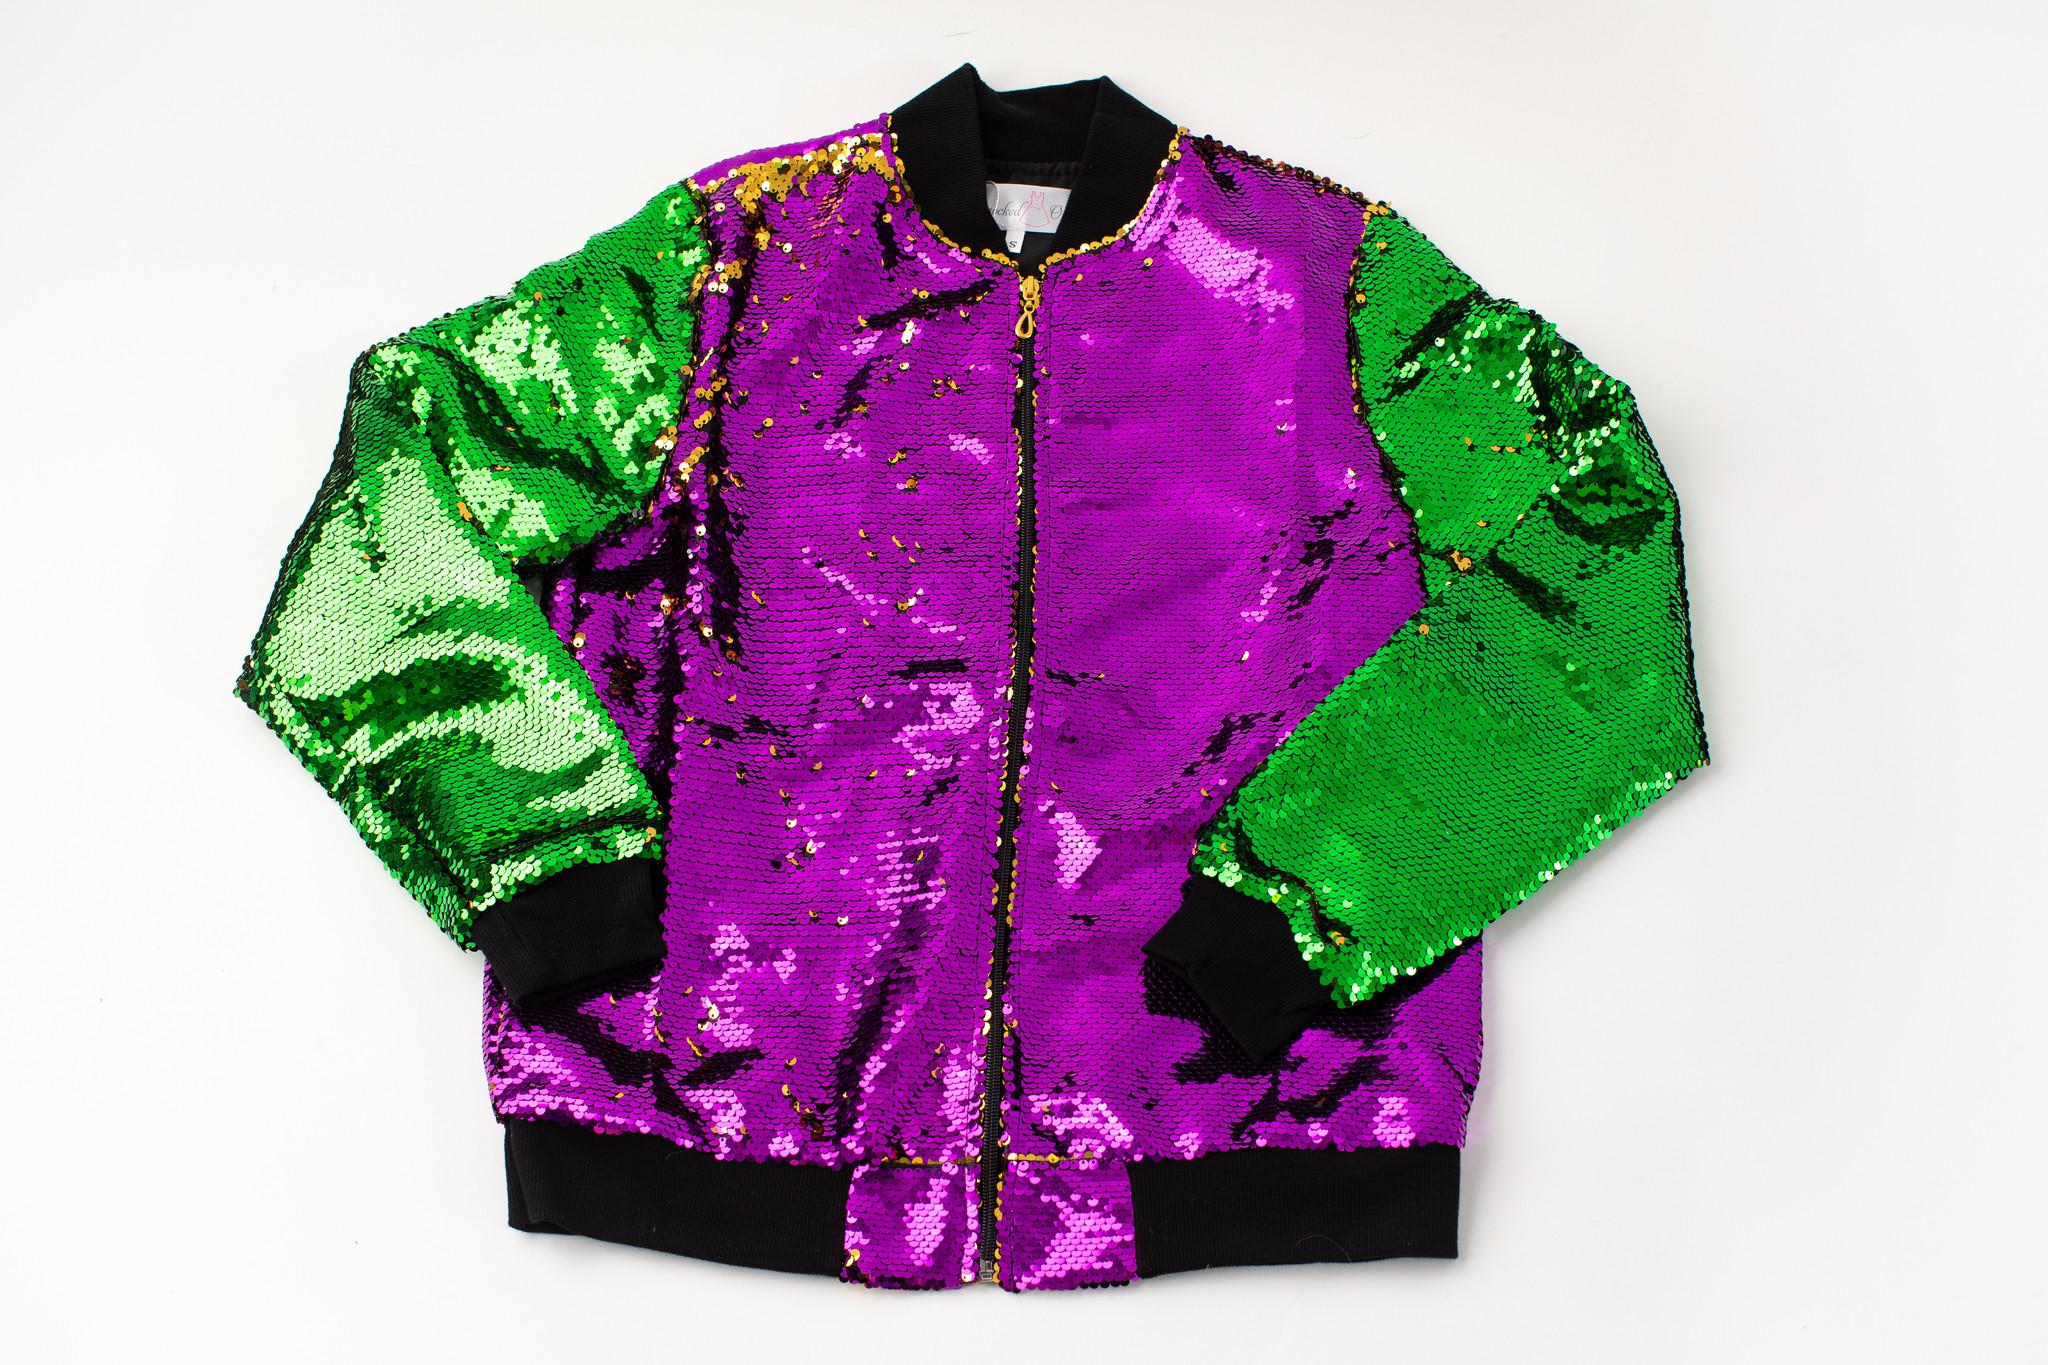 Mardi Gras Magic Sequin Jacket